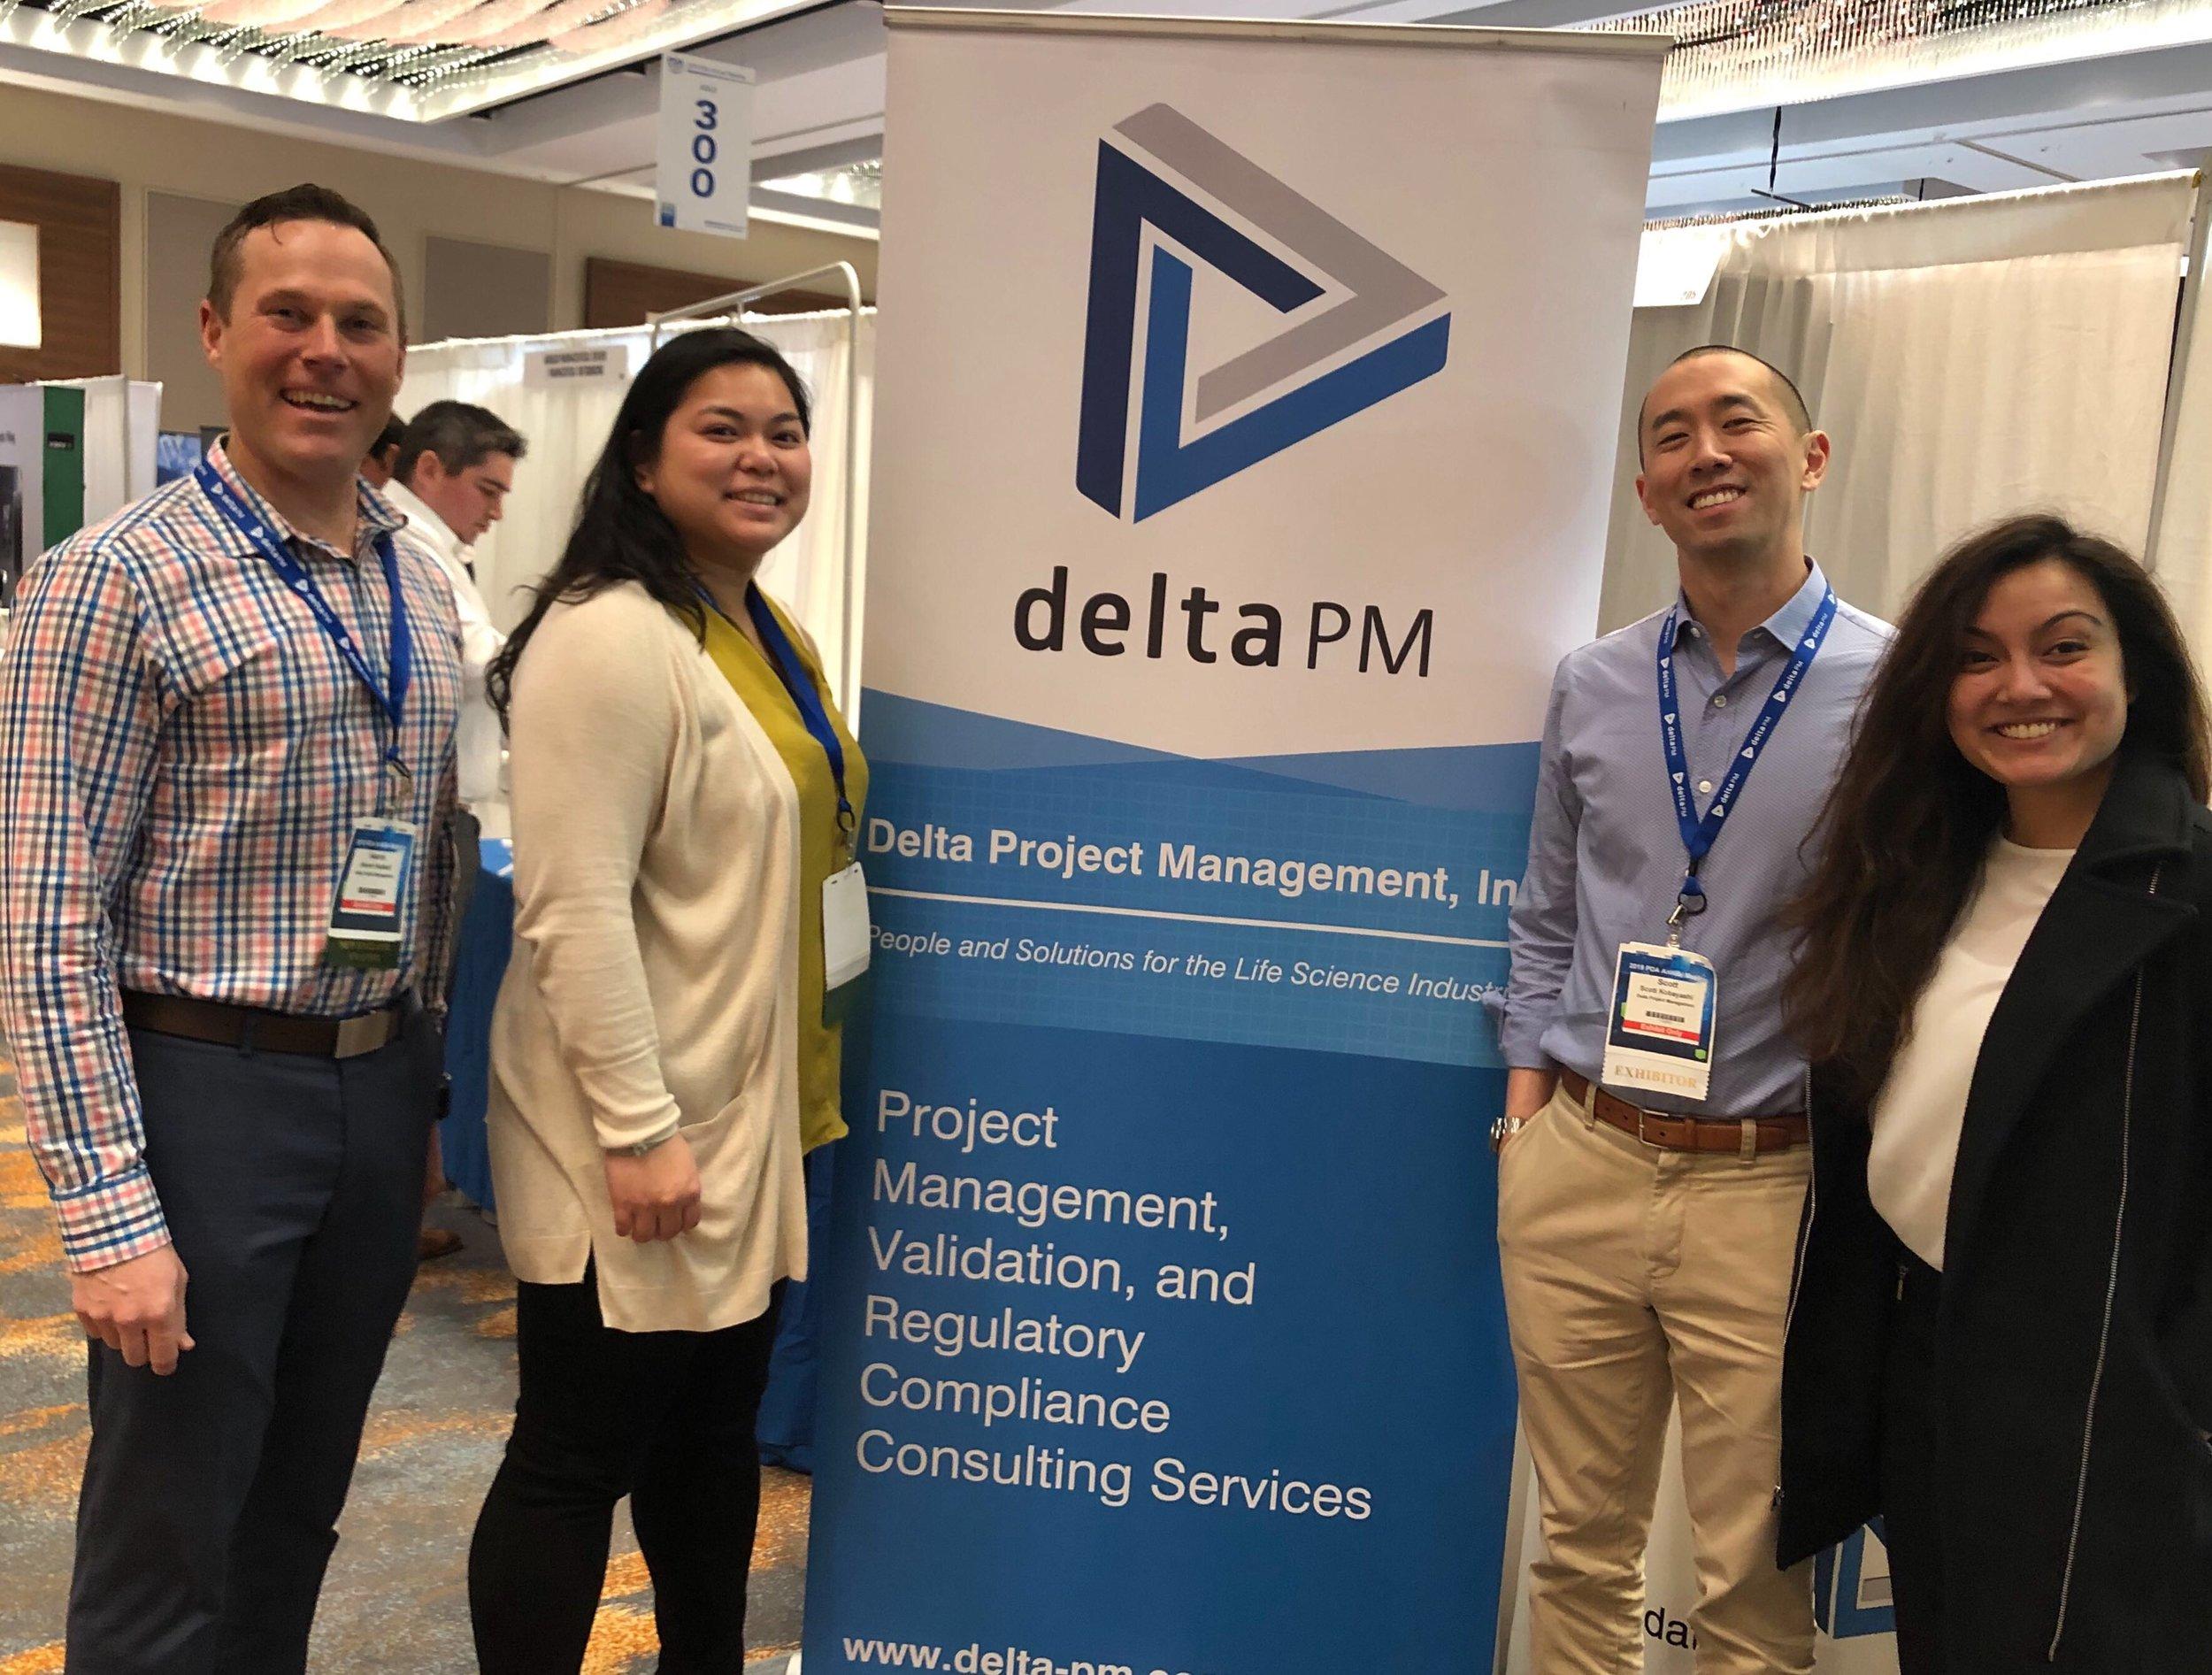 The Delta Crew: Aaron Hubbell, Stacy Pham, Scott Kobayashi, and Sumaiya Reza